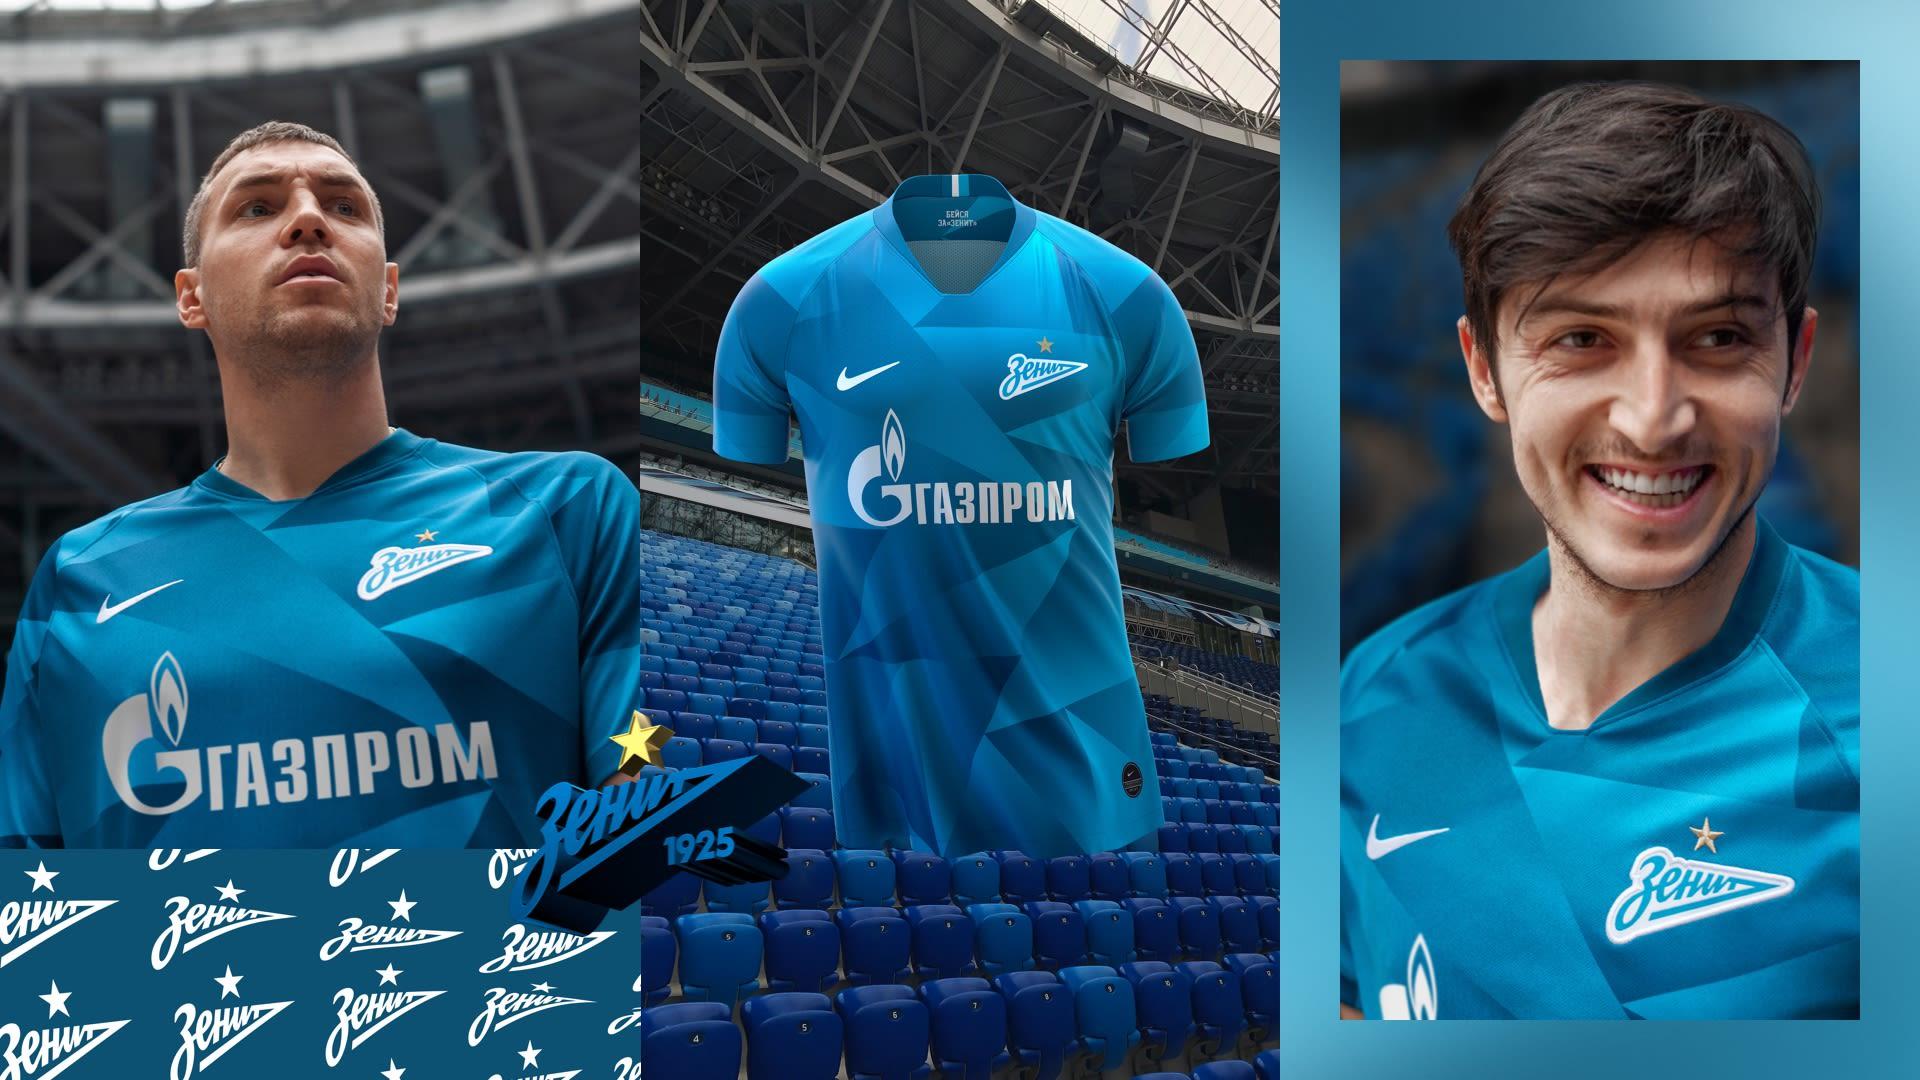 9258d4be5943f Джерси 2019/20 Zenit Stadium Home. Nike.com RU